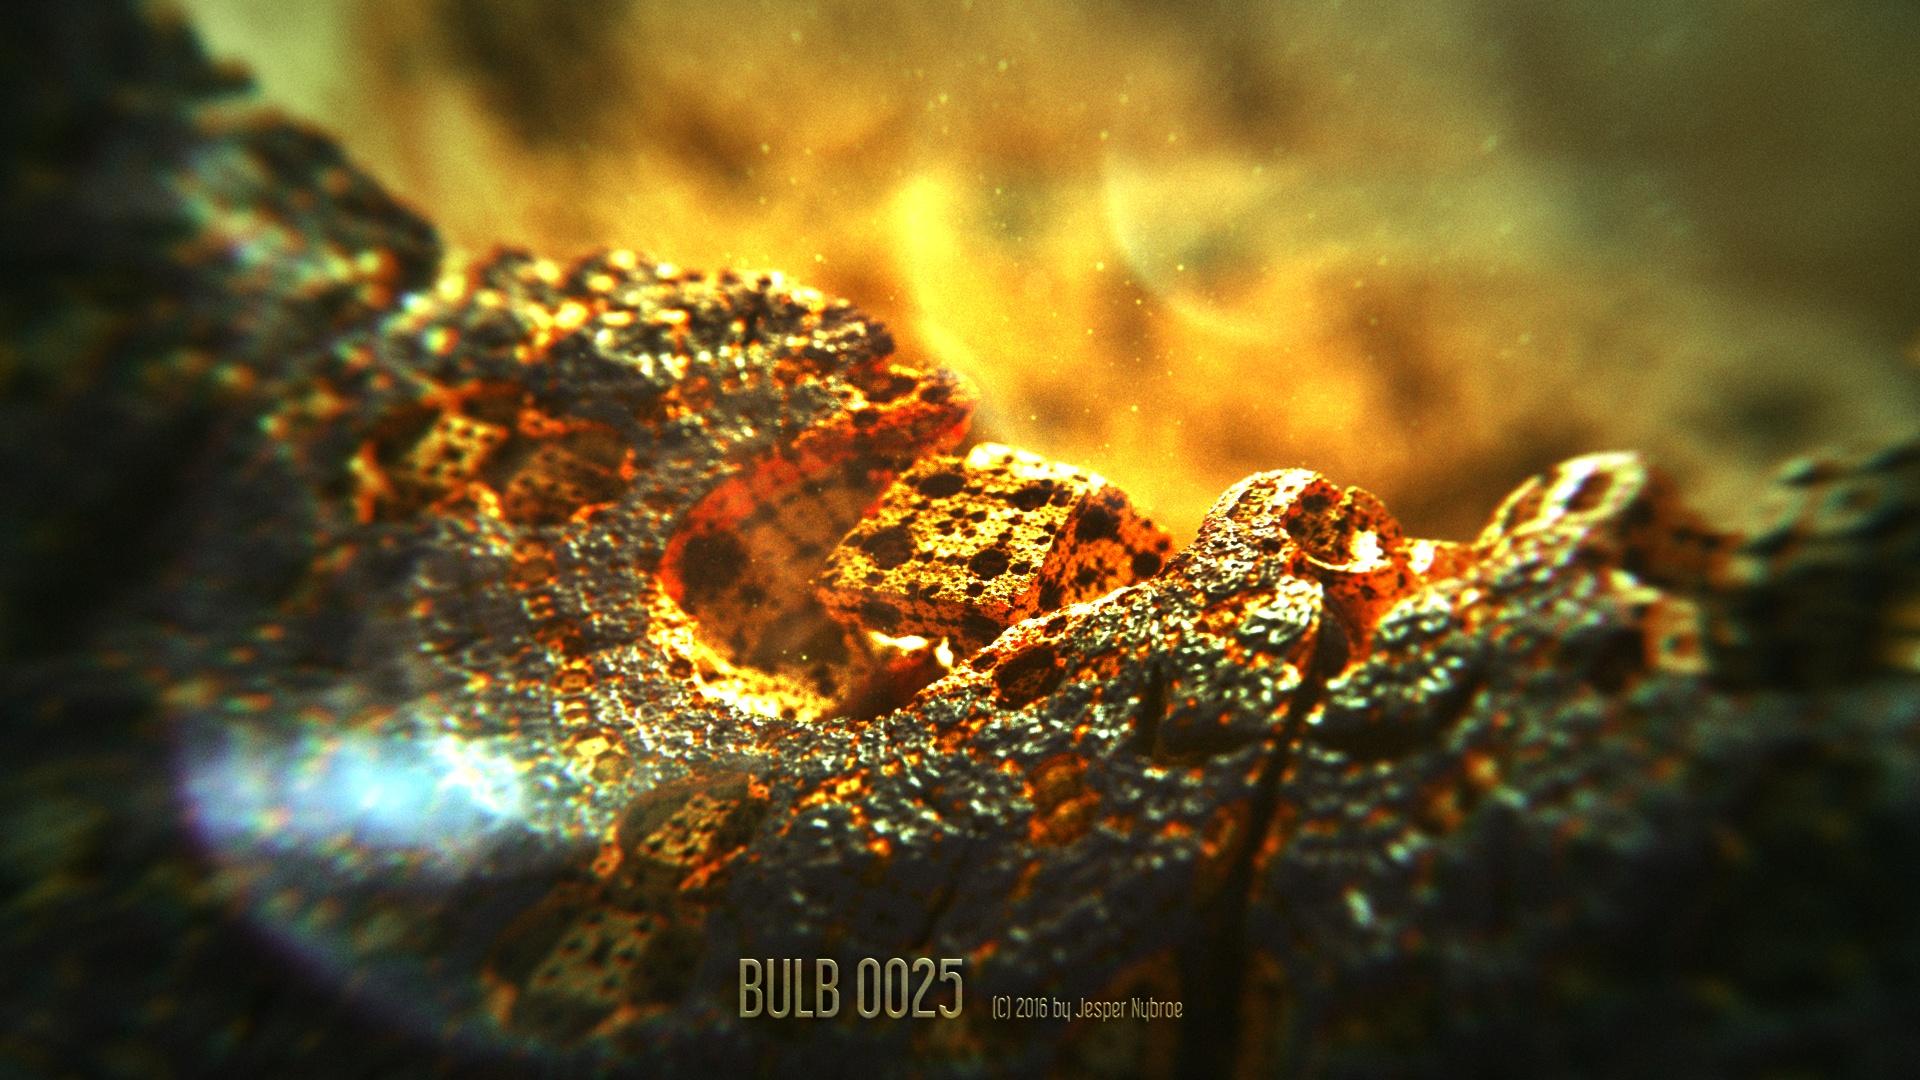 Bulb_0025.0001.jpg